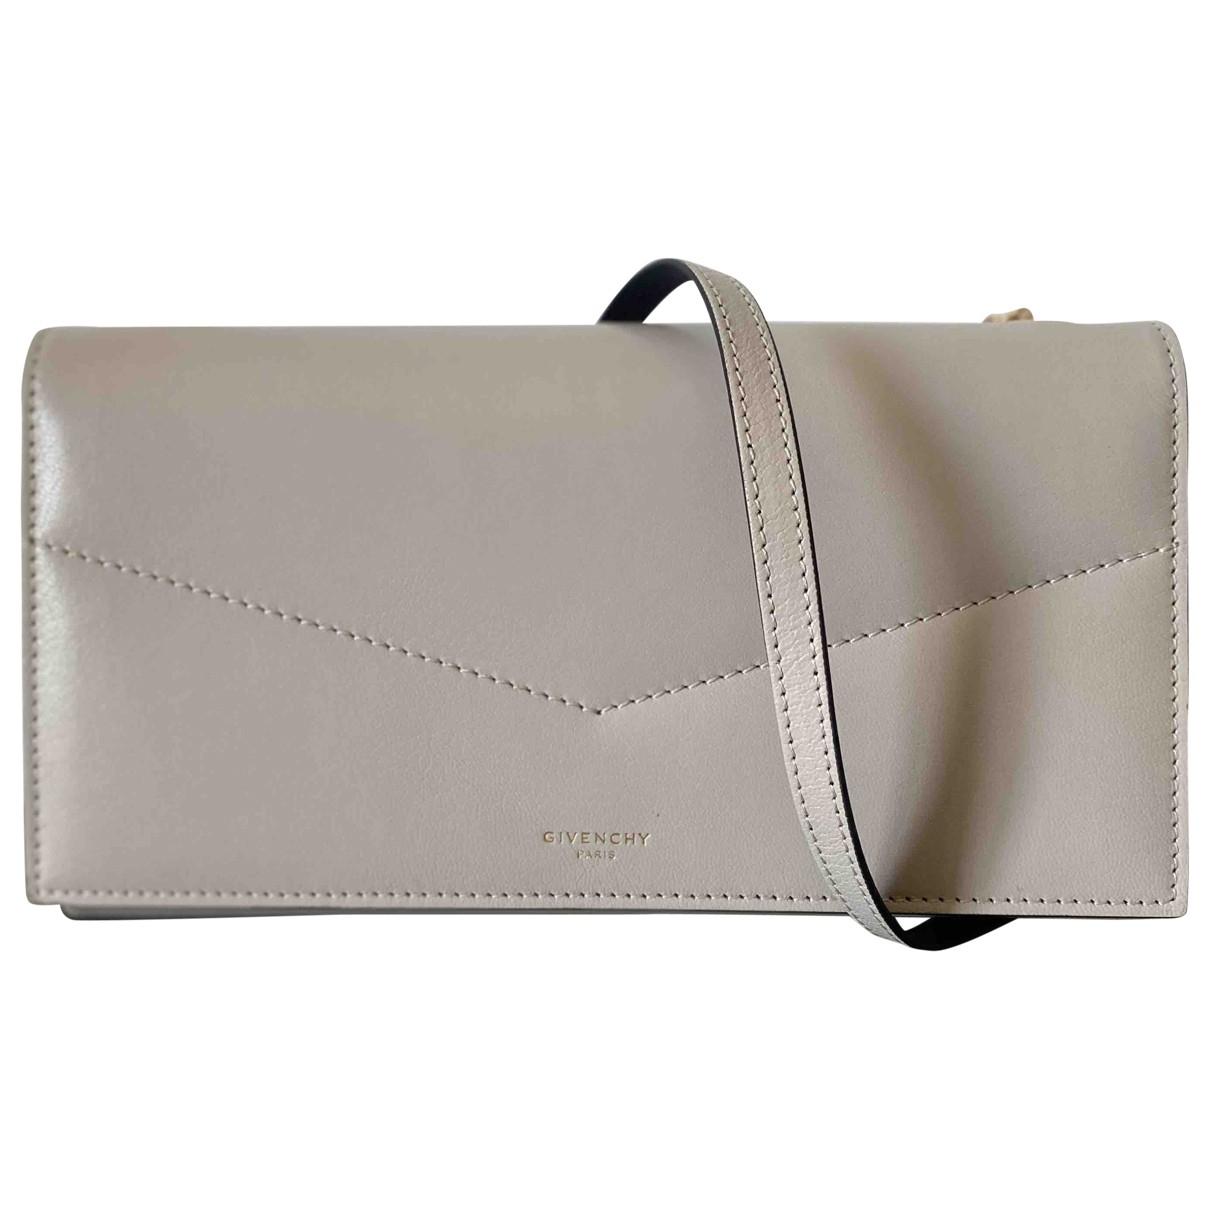 Givenchy \N Grey Leather Clutch bag for Women \N